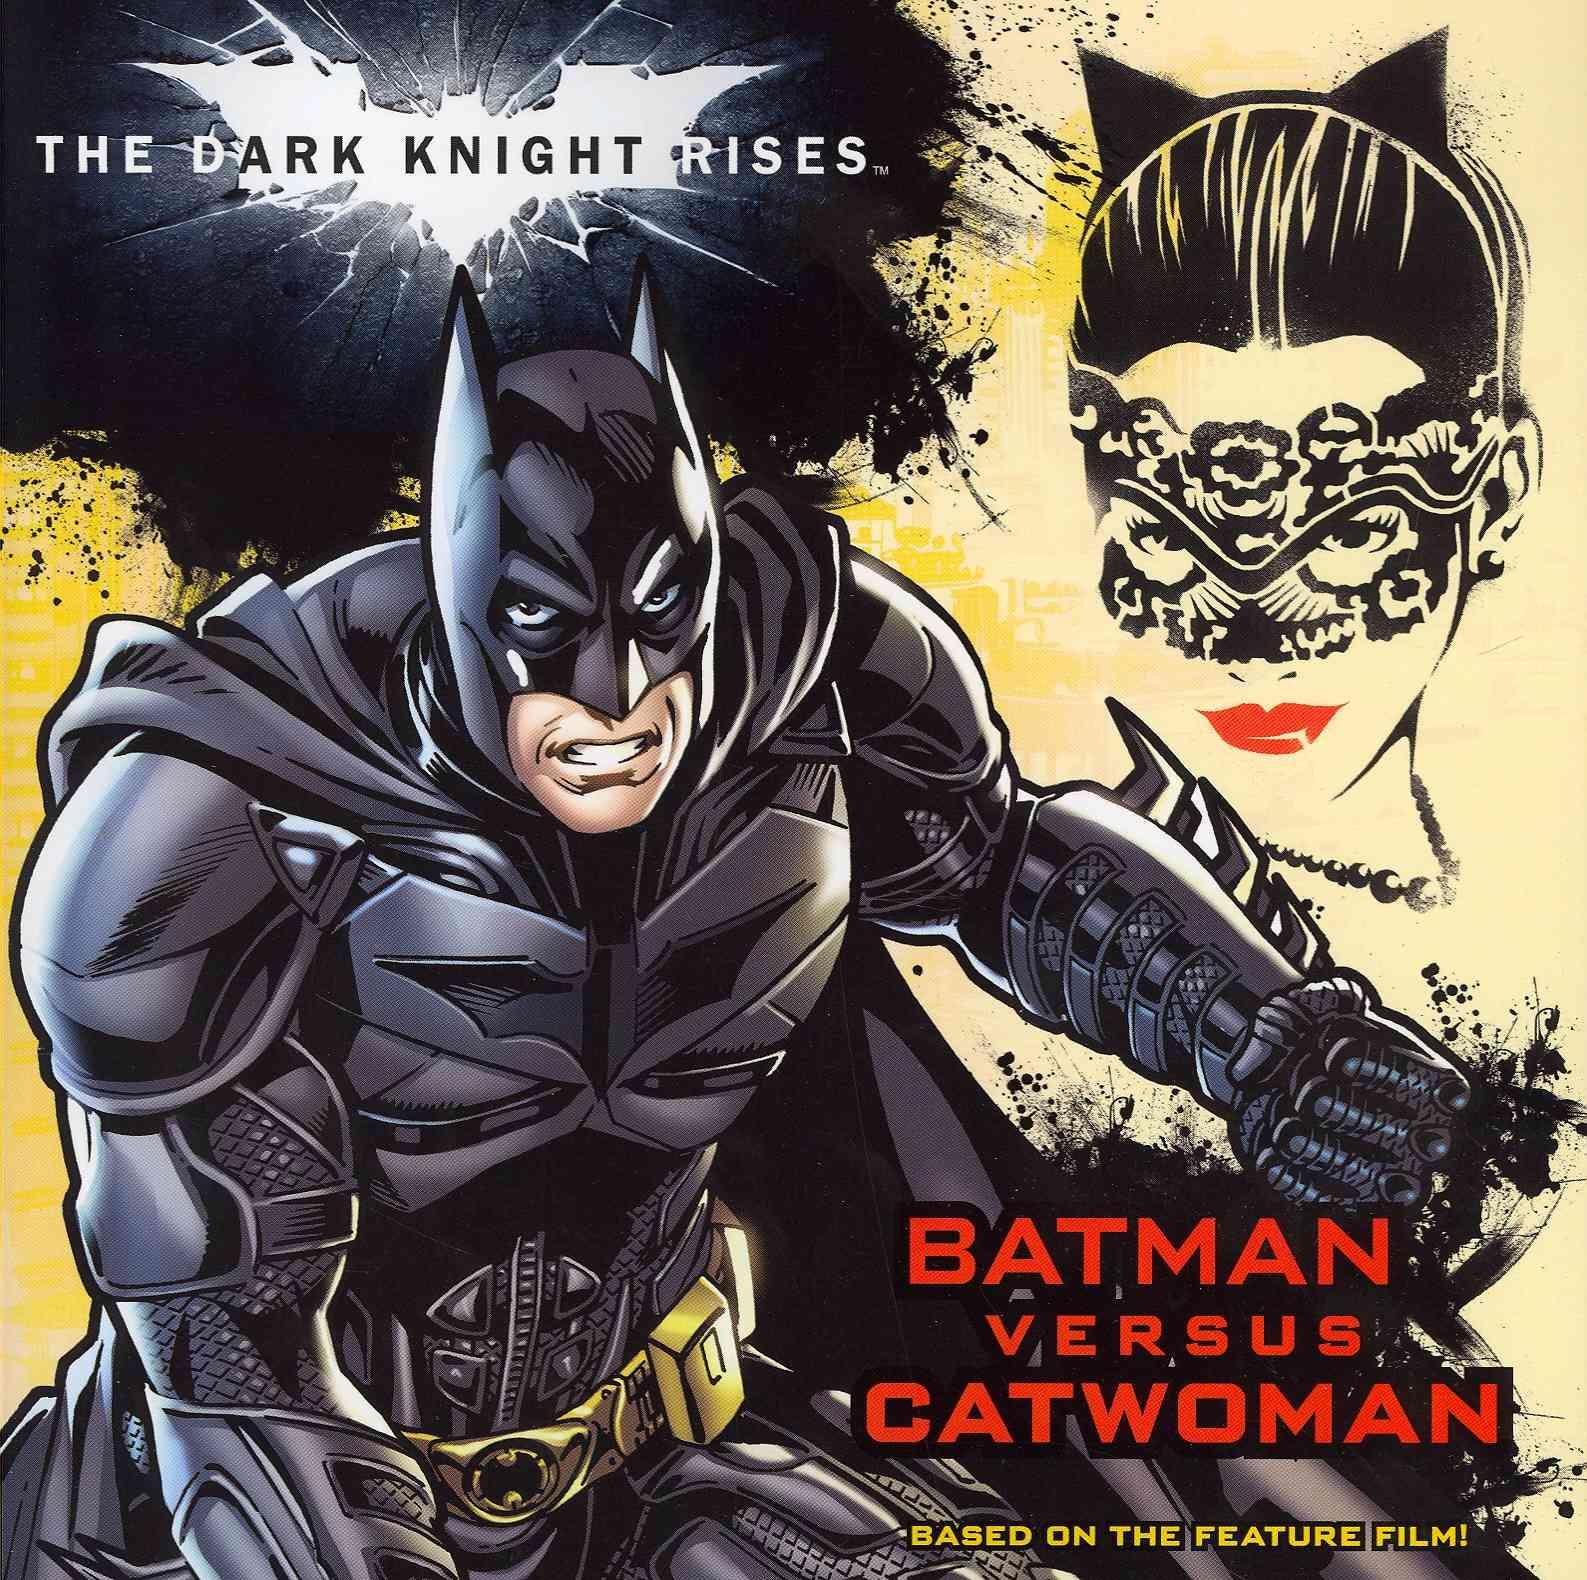 The Dark Knight Rises: Batman Versus Catwoman (Paperback)